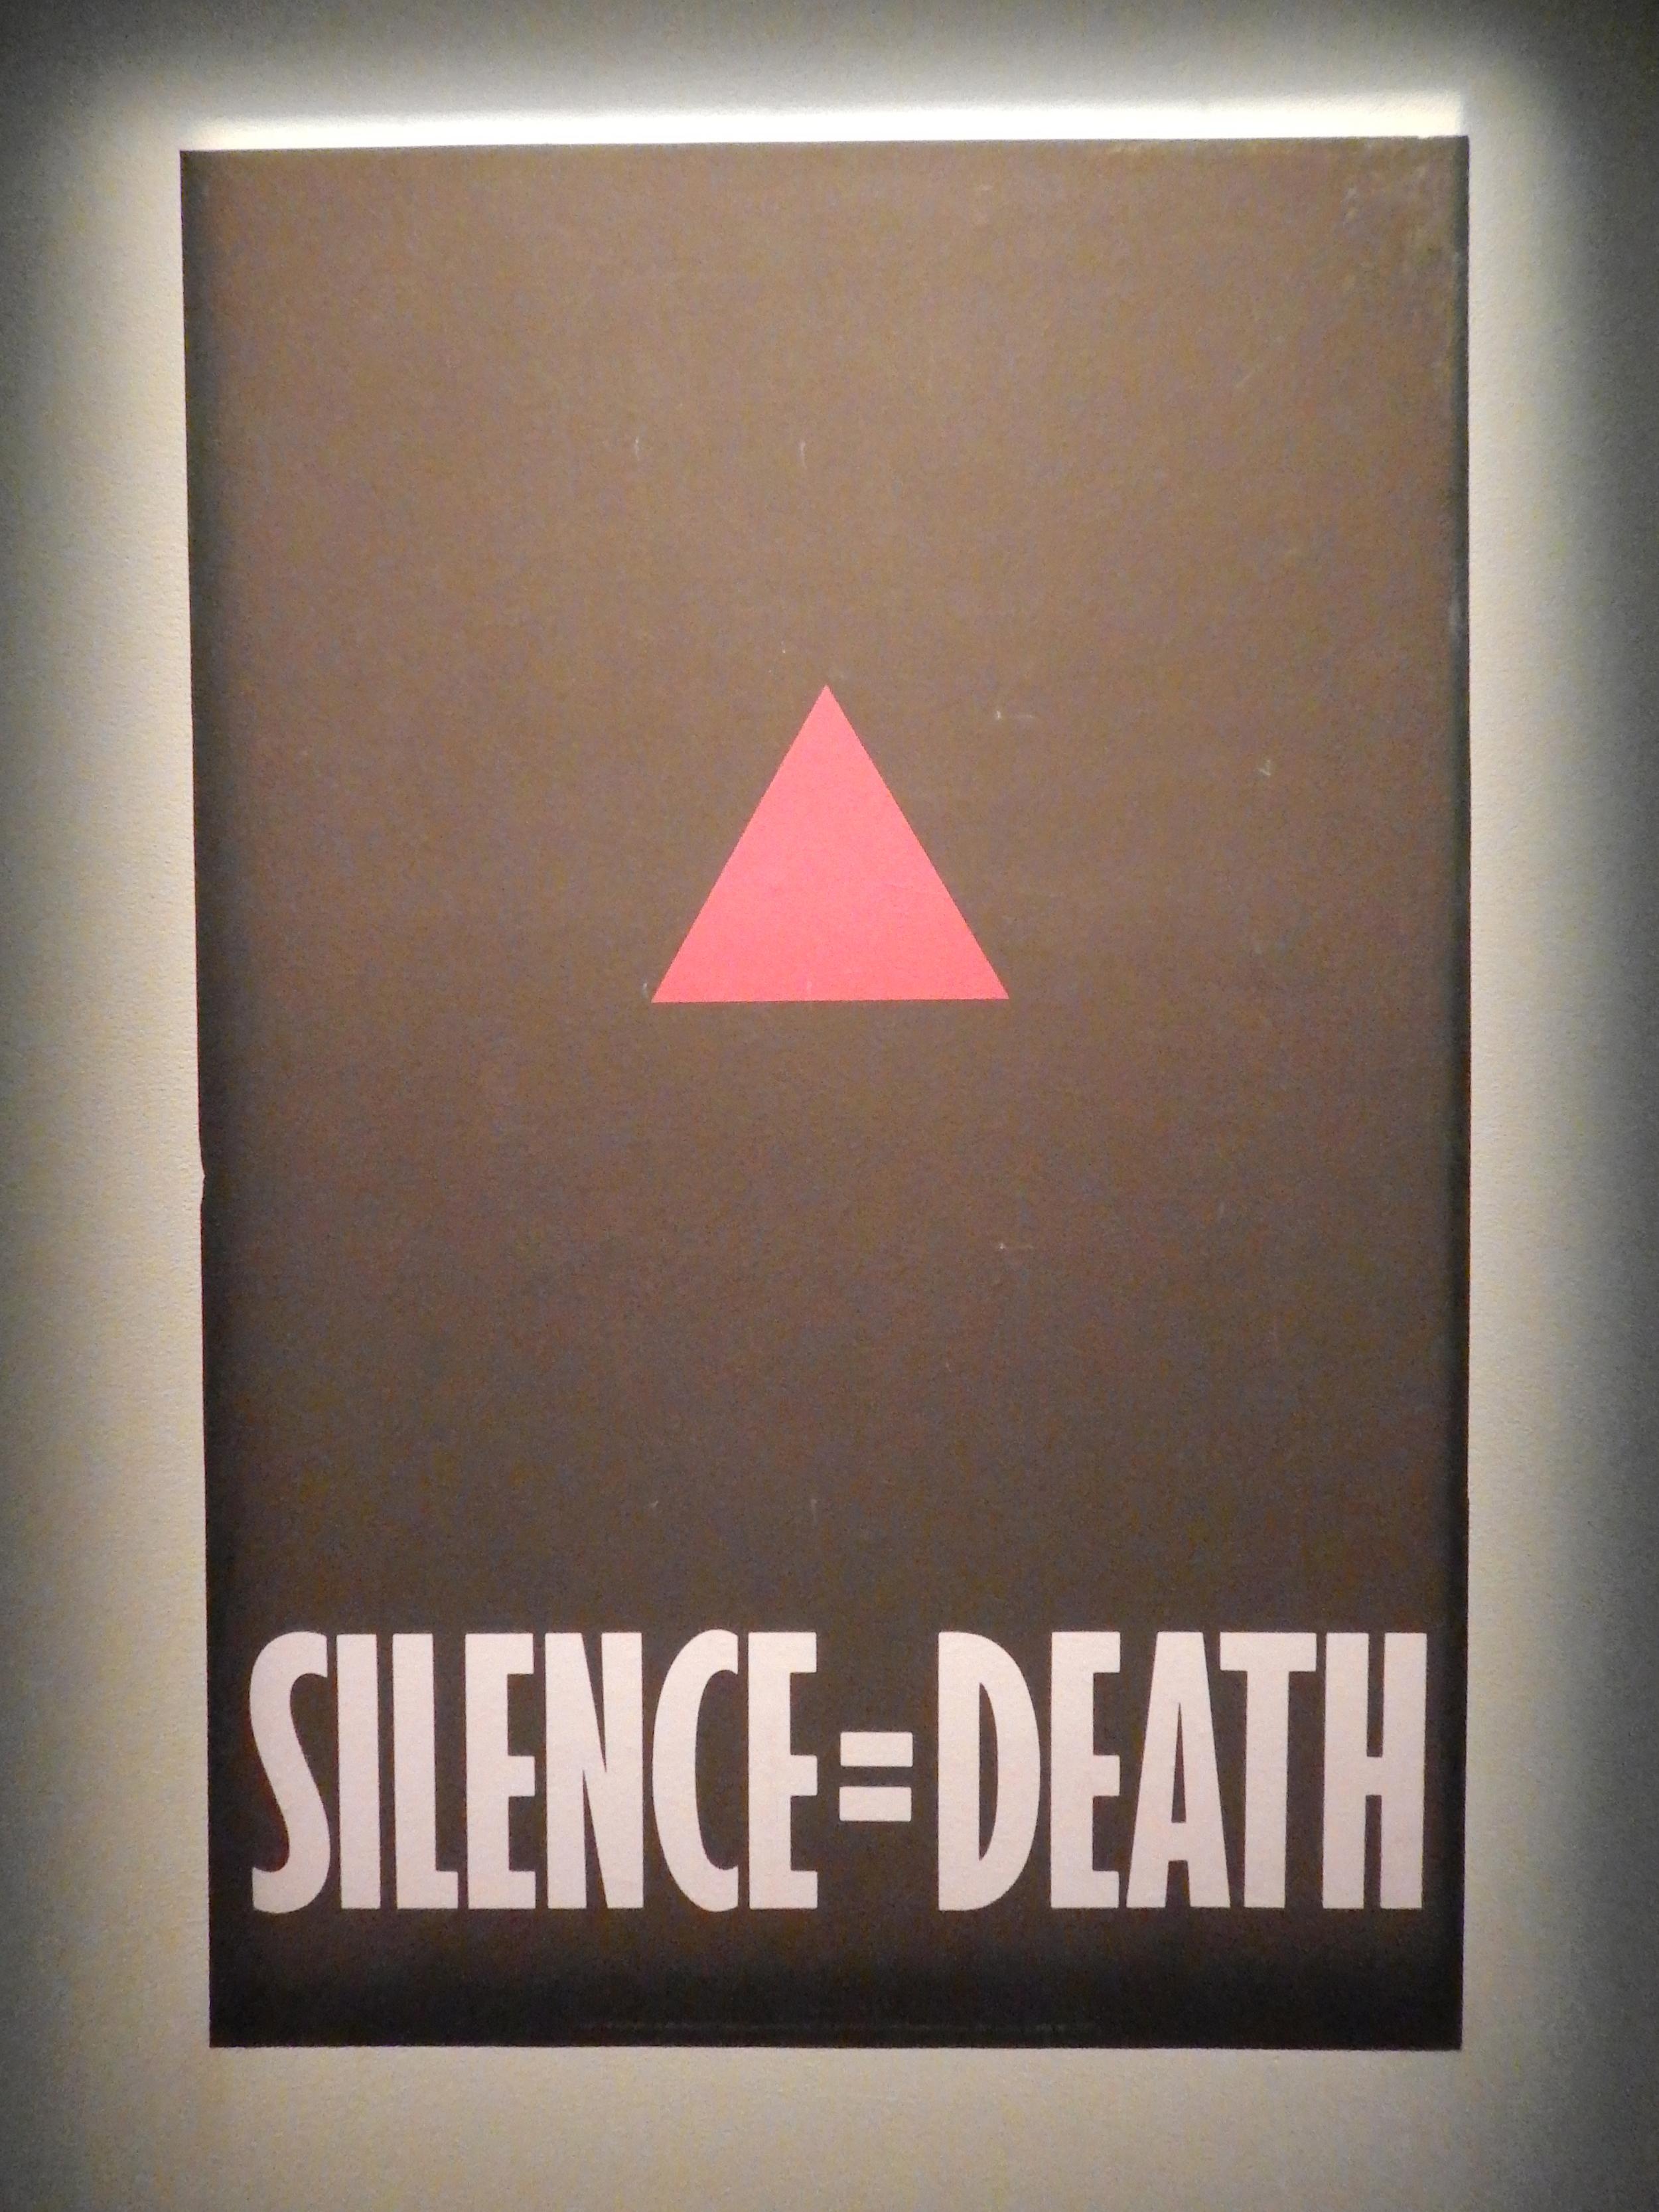 Zero Tolerance: digital projection ofACT UP New York, SILENCE=DEATH (1987)